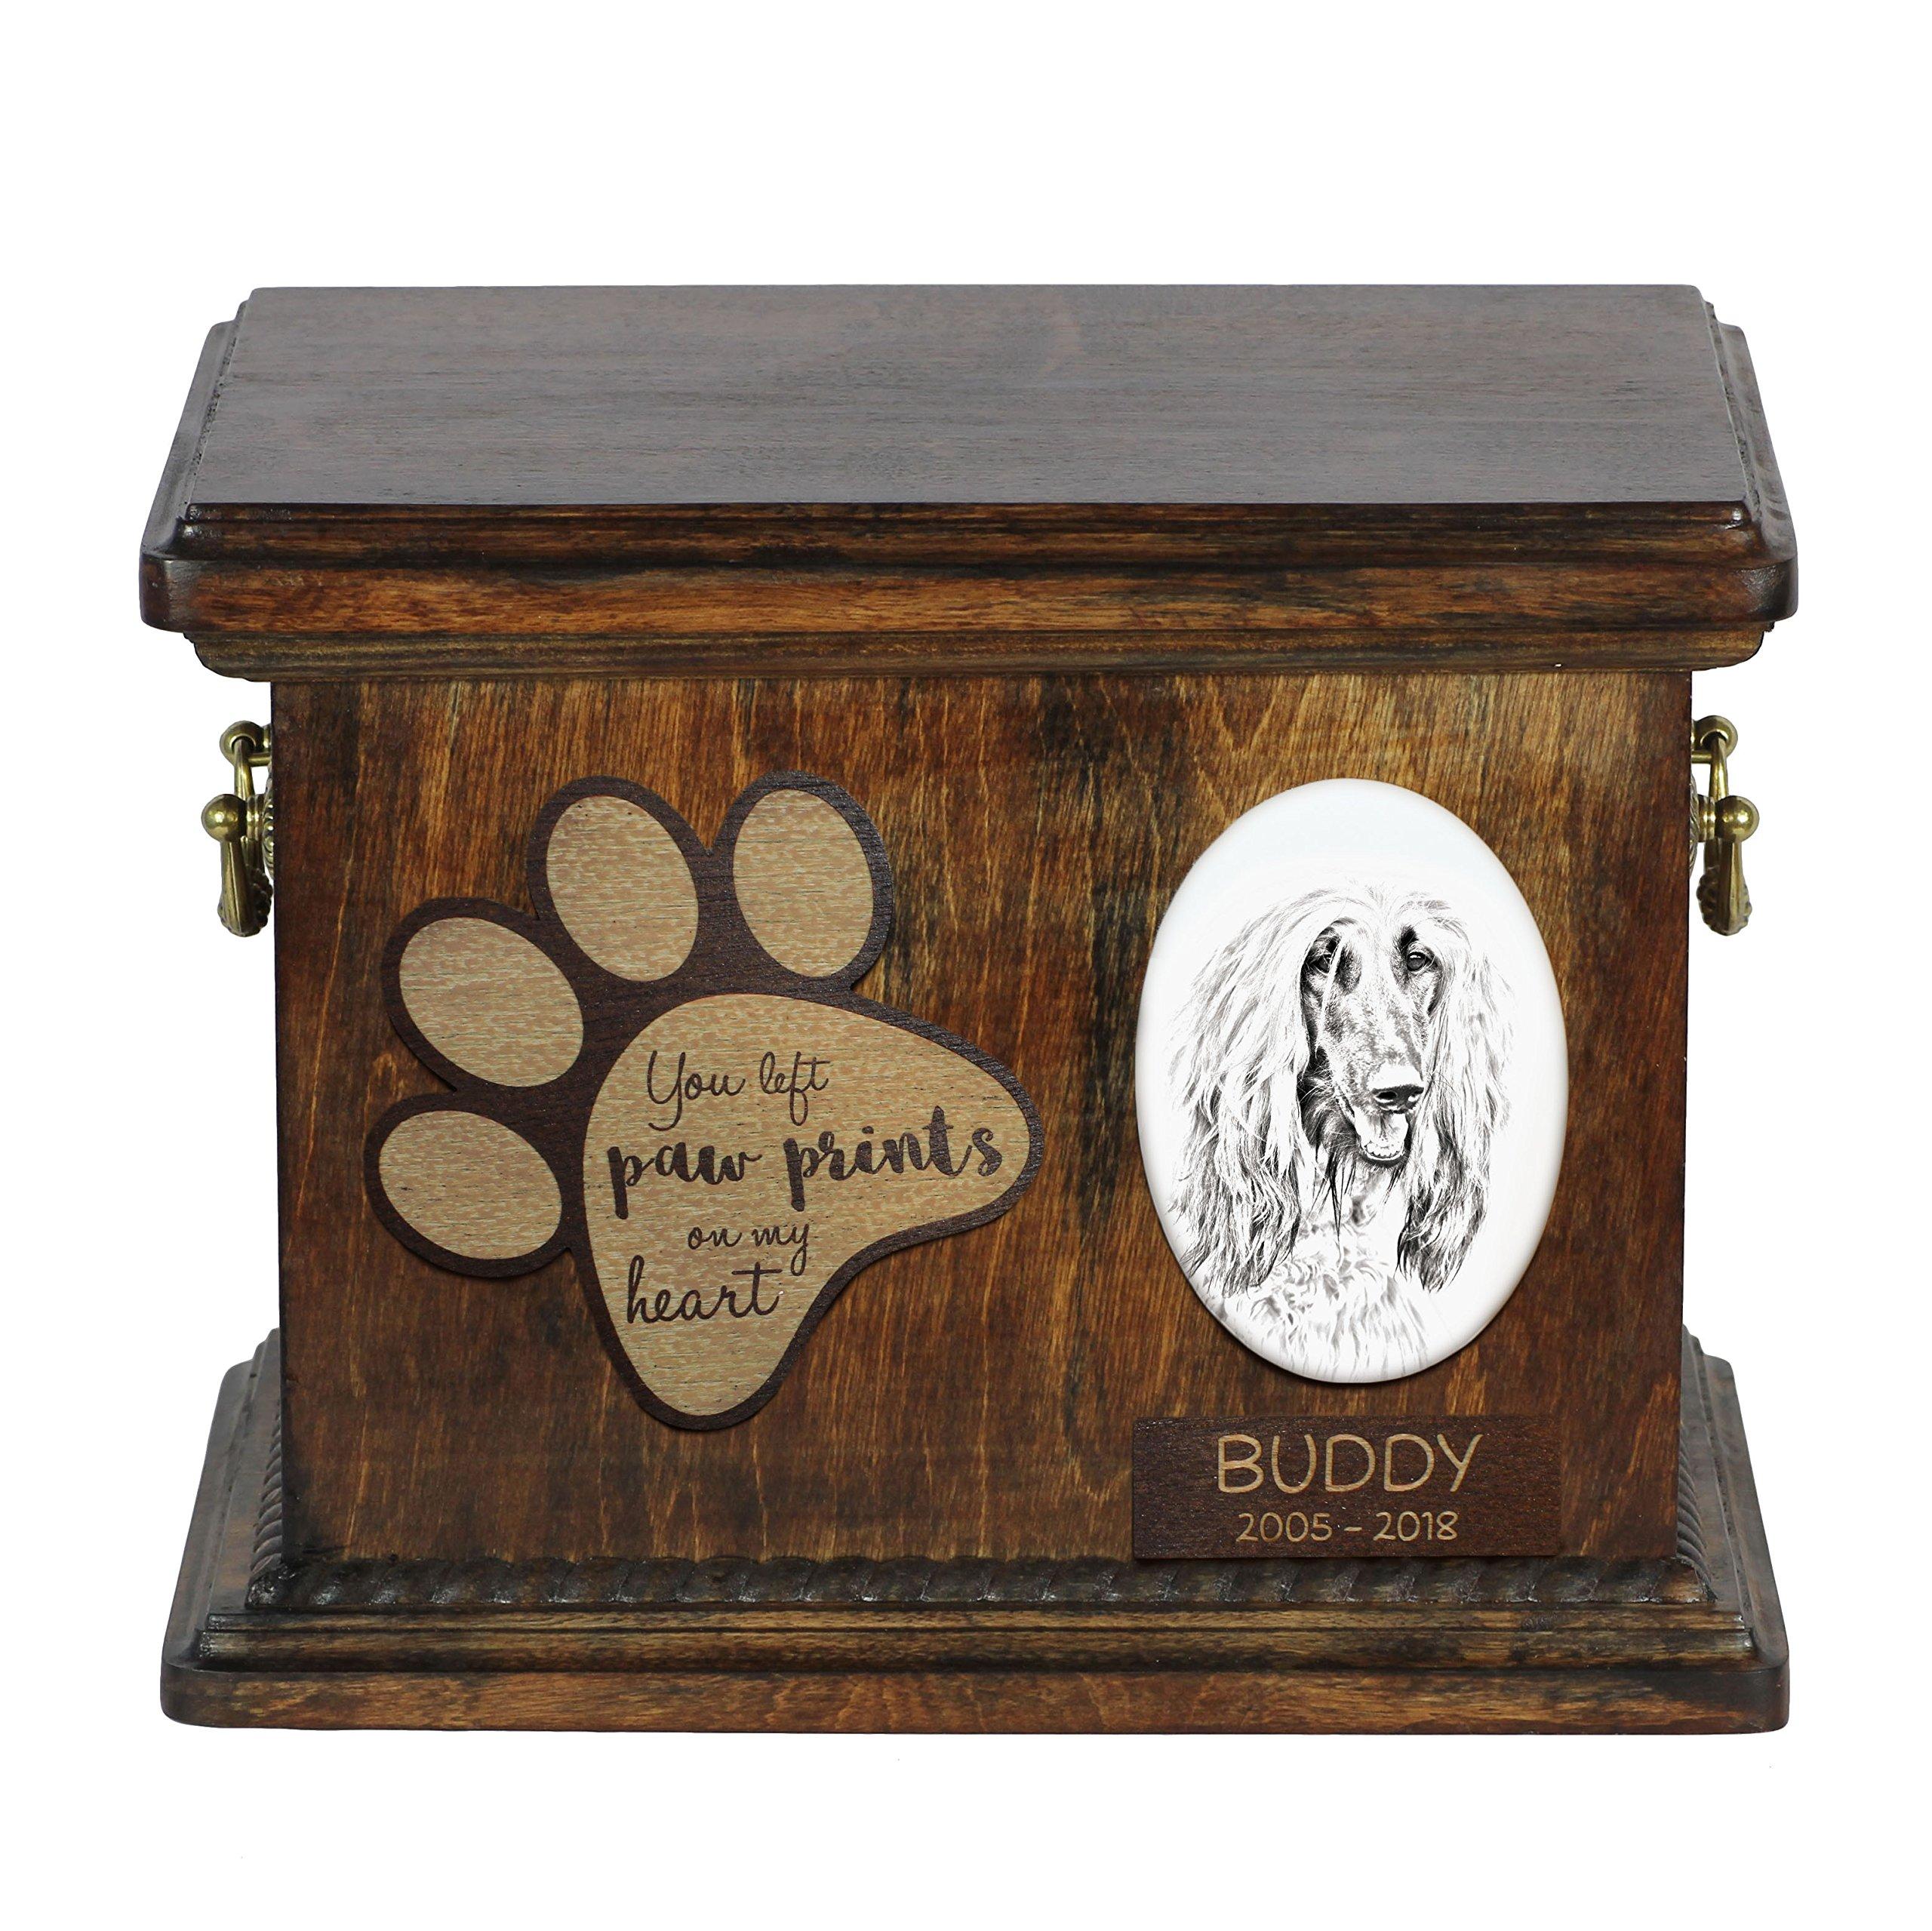 ArtDog Ltd. Afghan Hound, urn for dog's ashes with ceramic plate and description